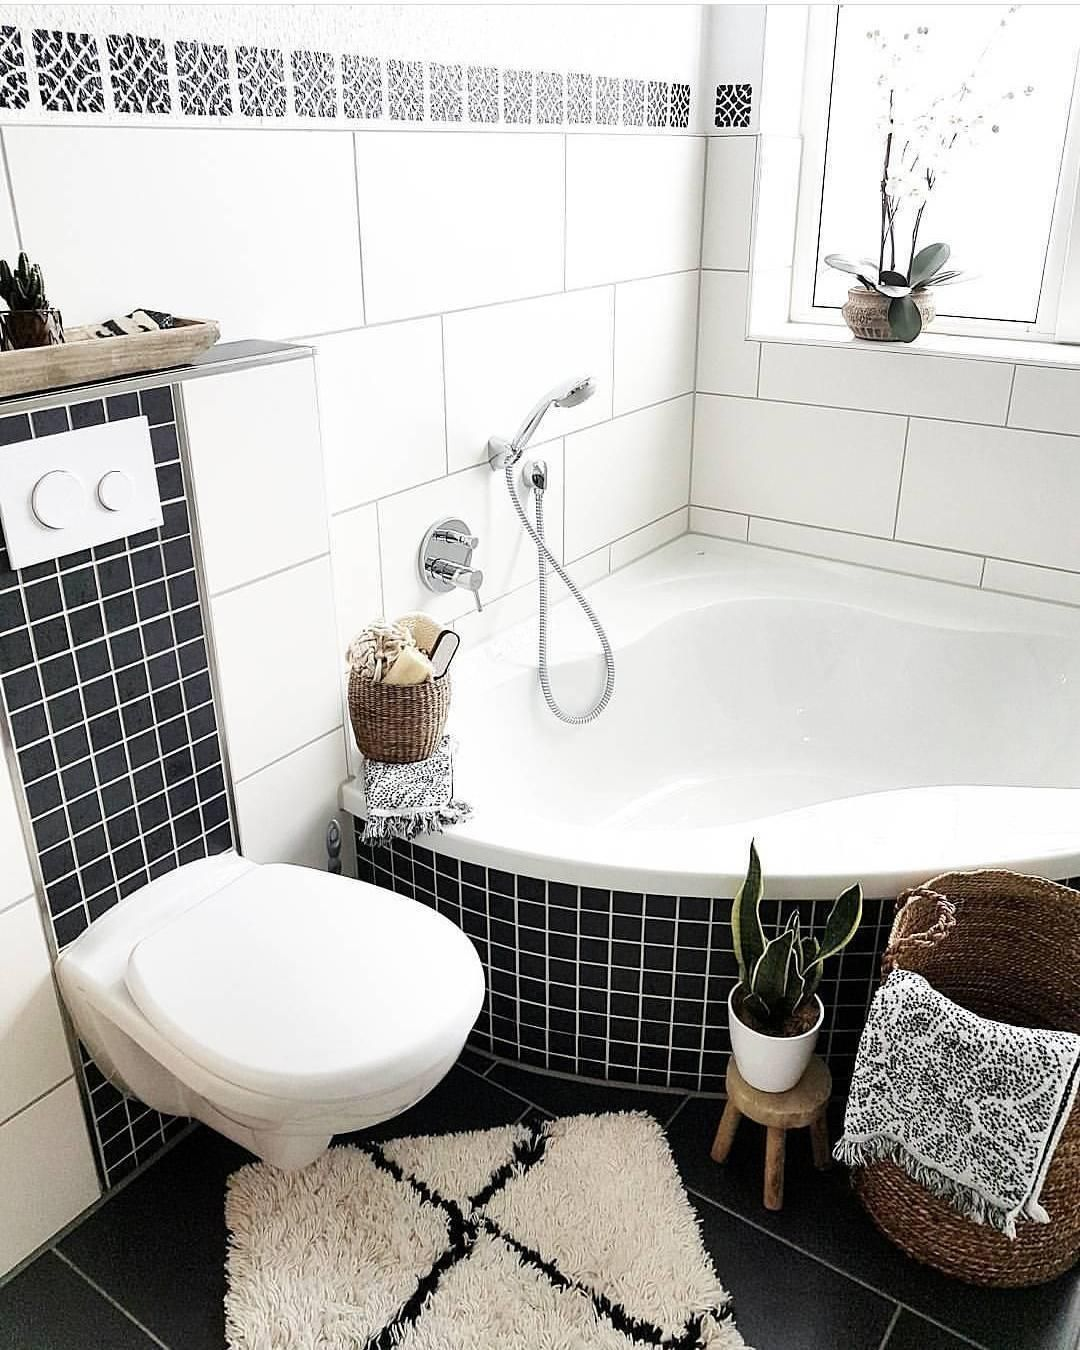 Badezimmer Deko Körbe